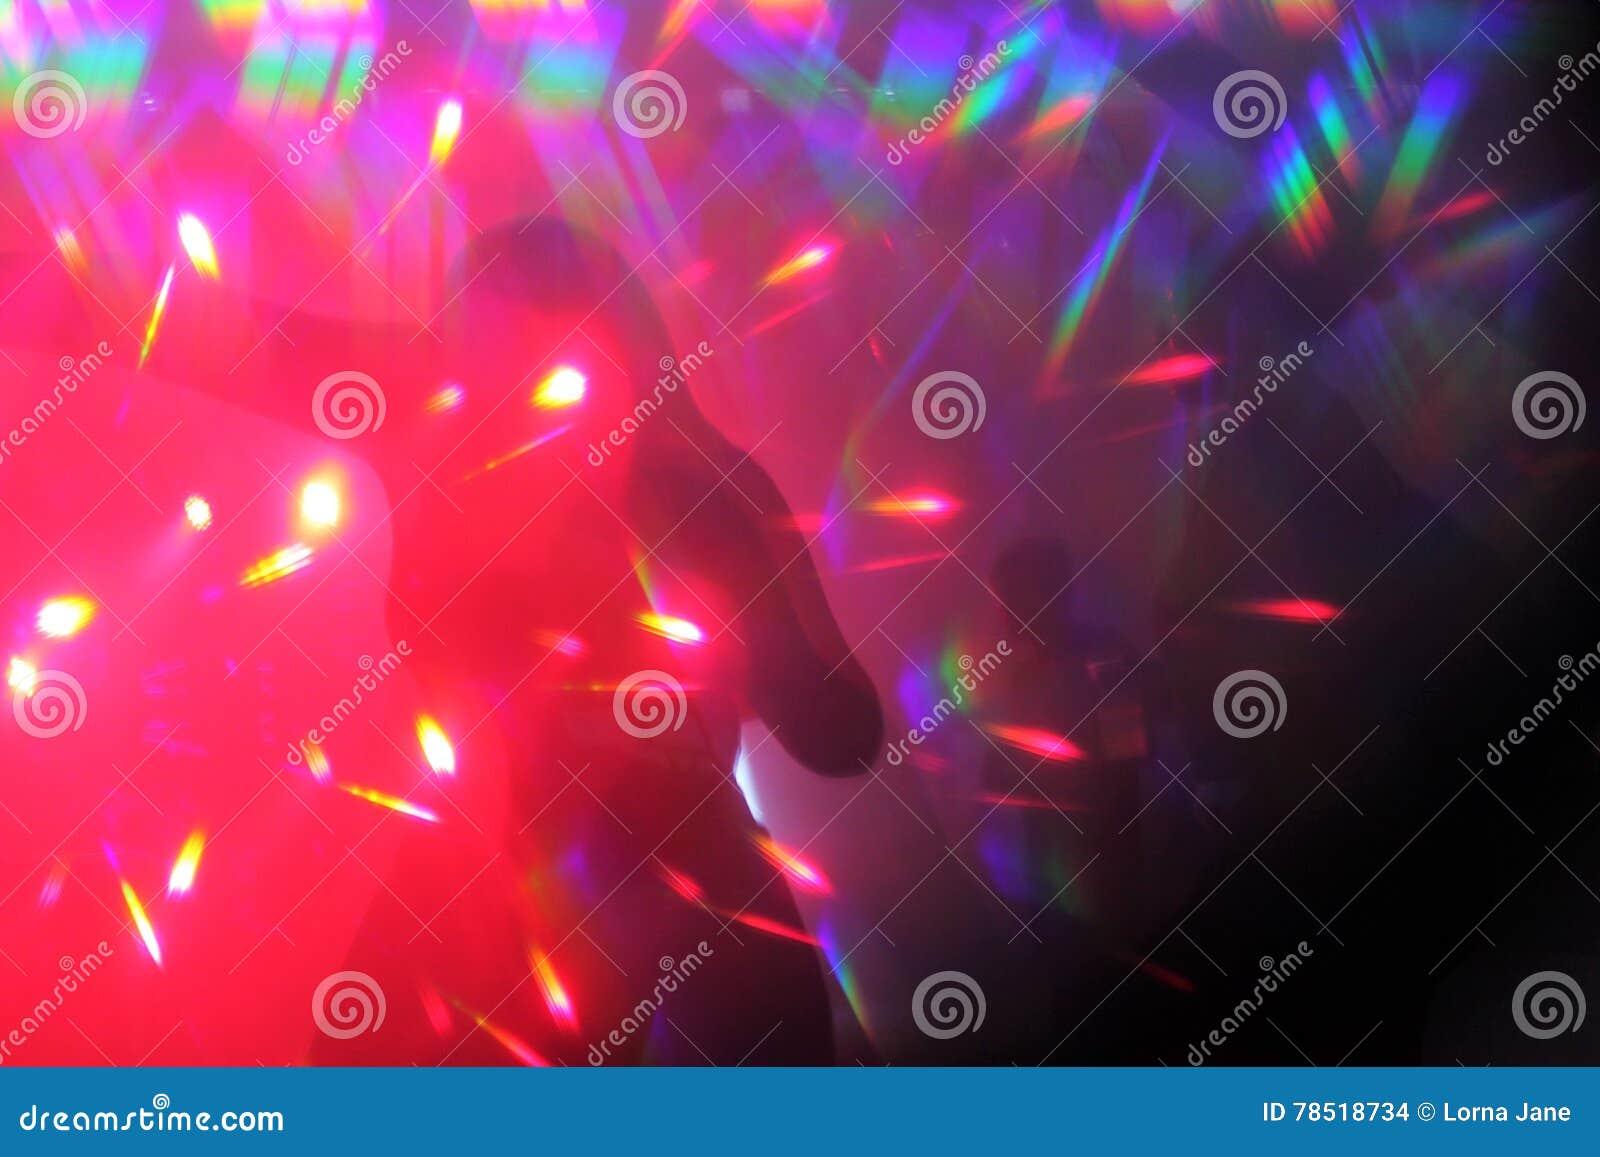 nightclub background abstract lights nightclub dance party background